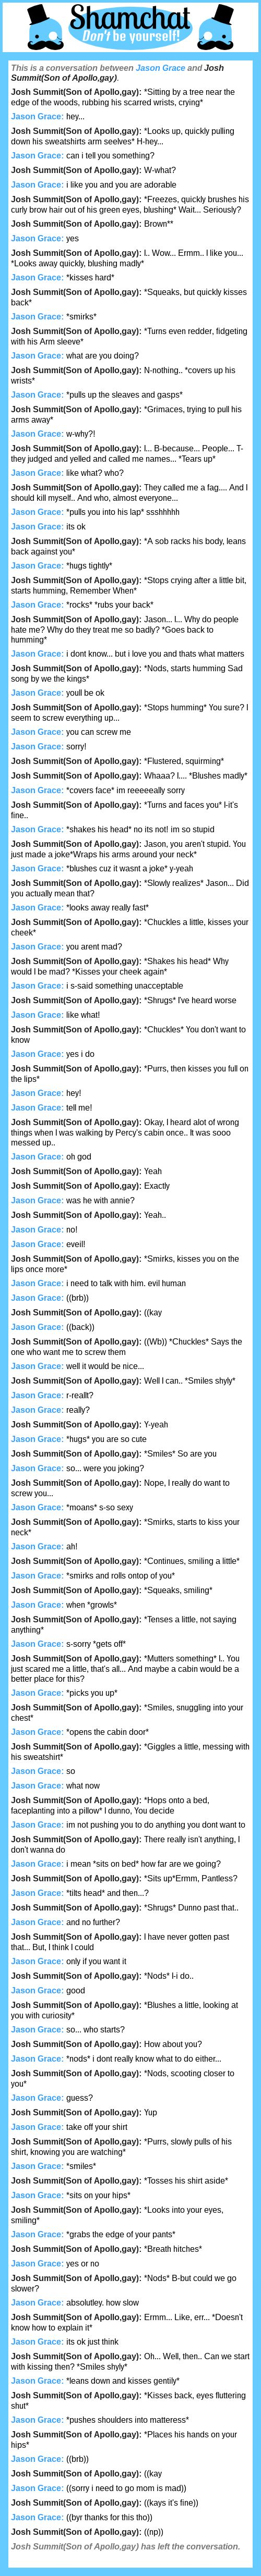 A conversation between Josh Summit(Son of Apollo,gay) and Jason Grace